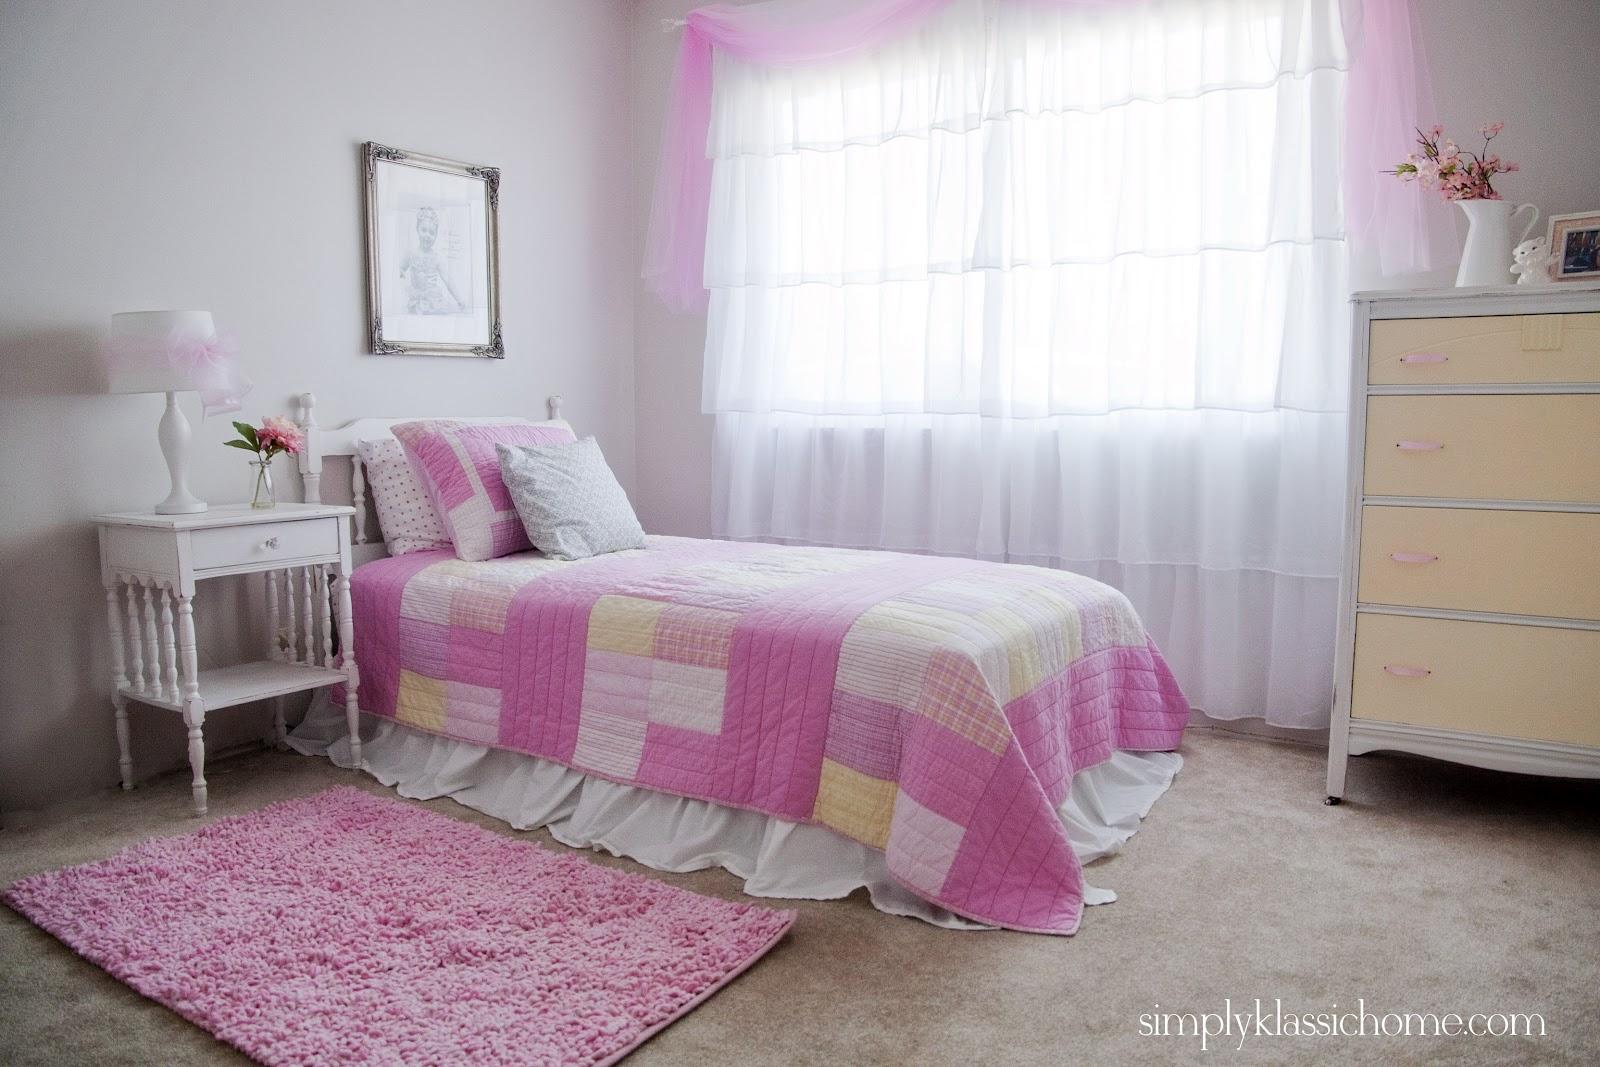 Little Girl's Princess Room Makeover Reveal